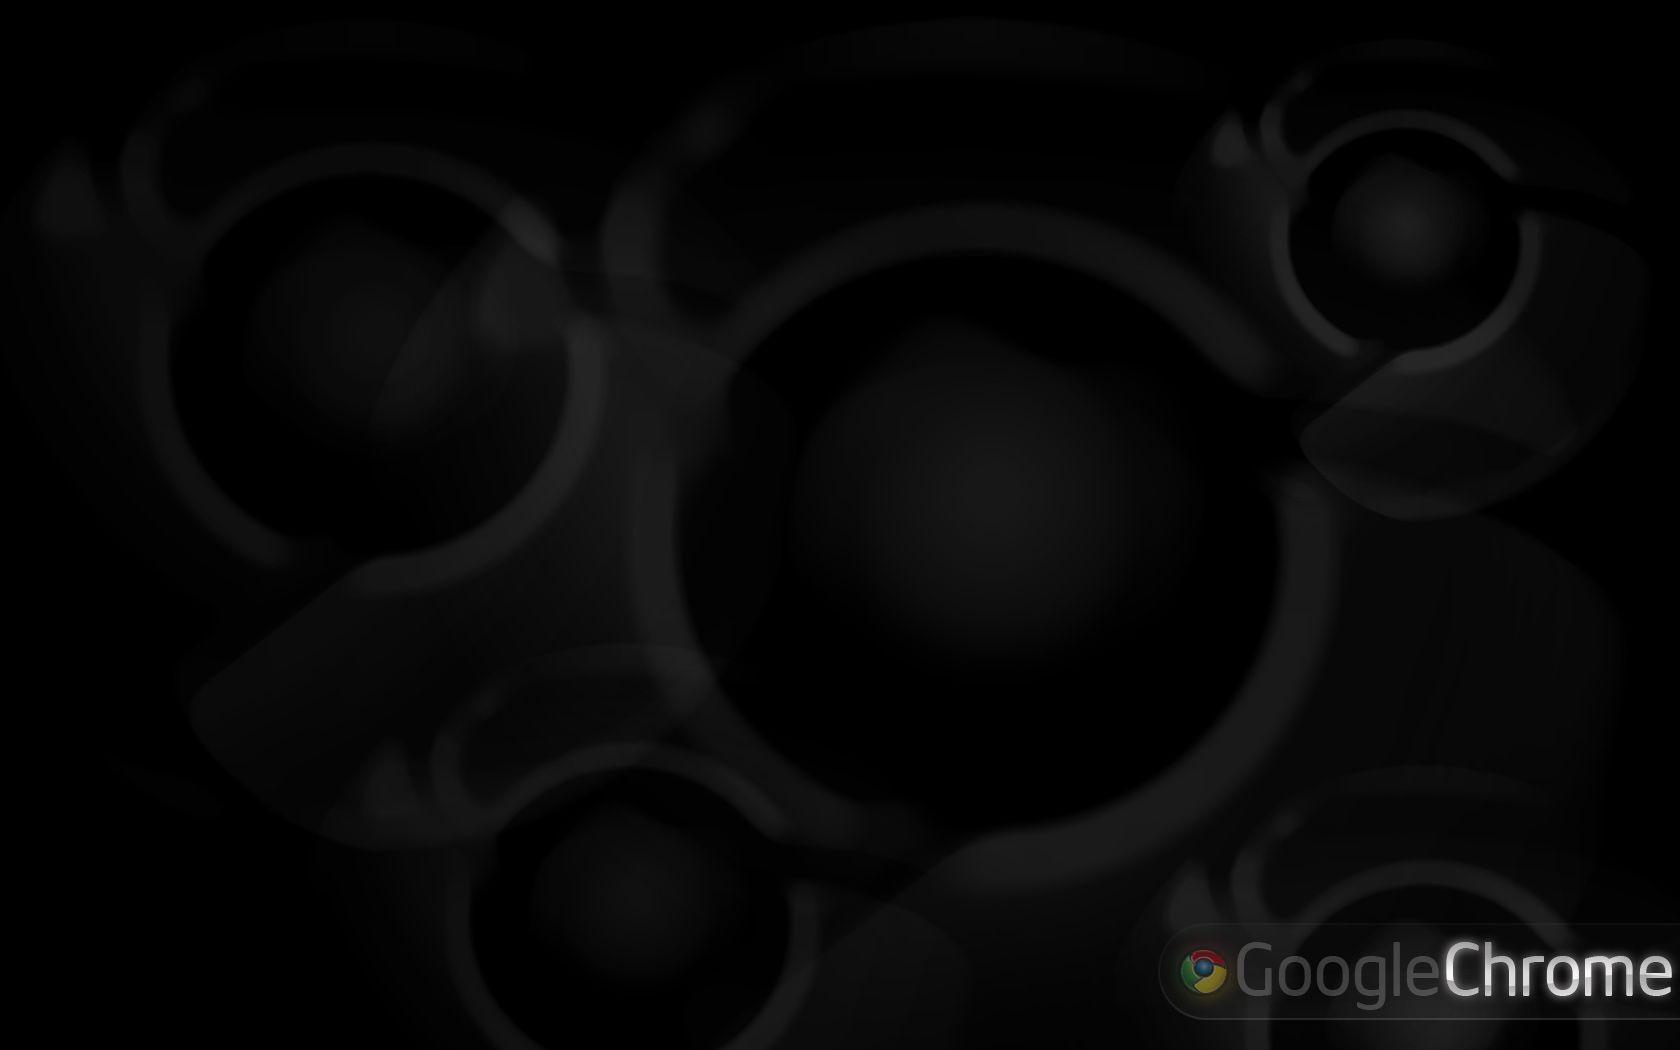 Google Chrome Wallpaper Backgrounds - Wallpaper Cave